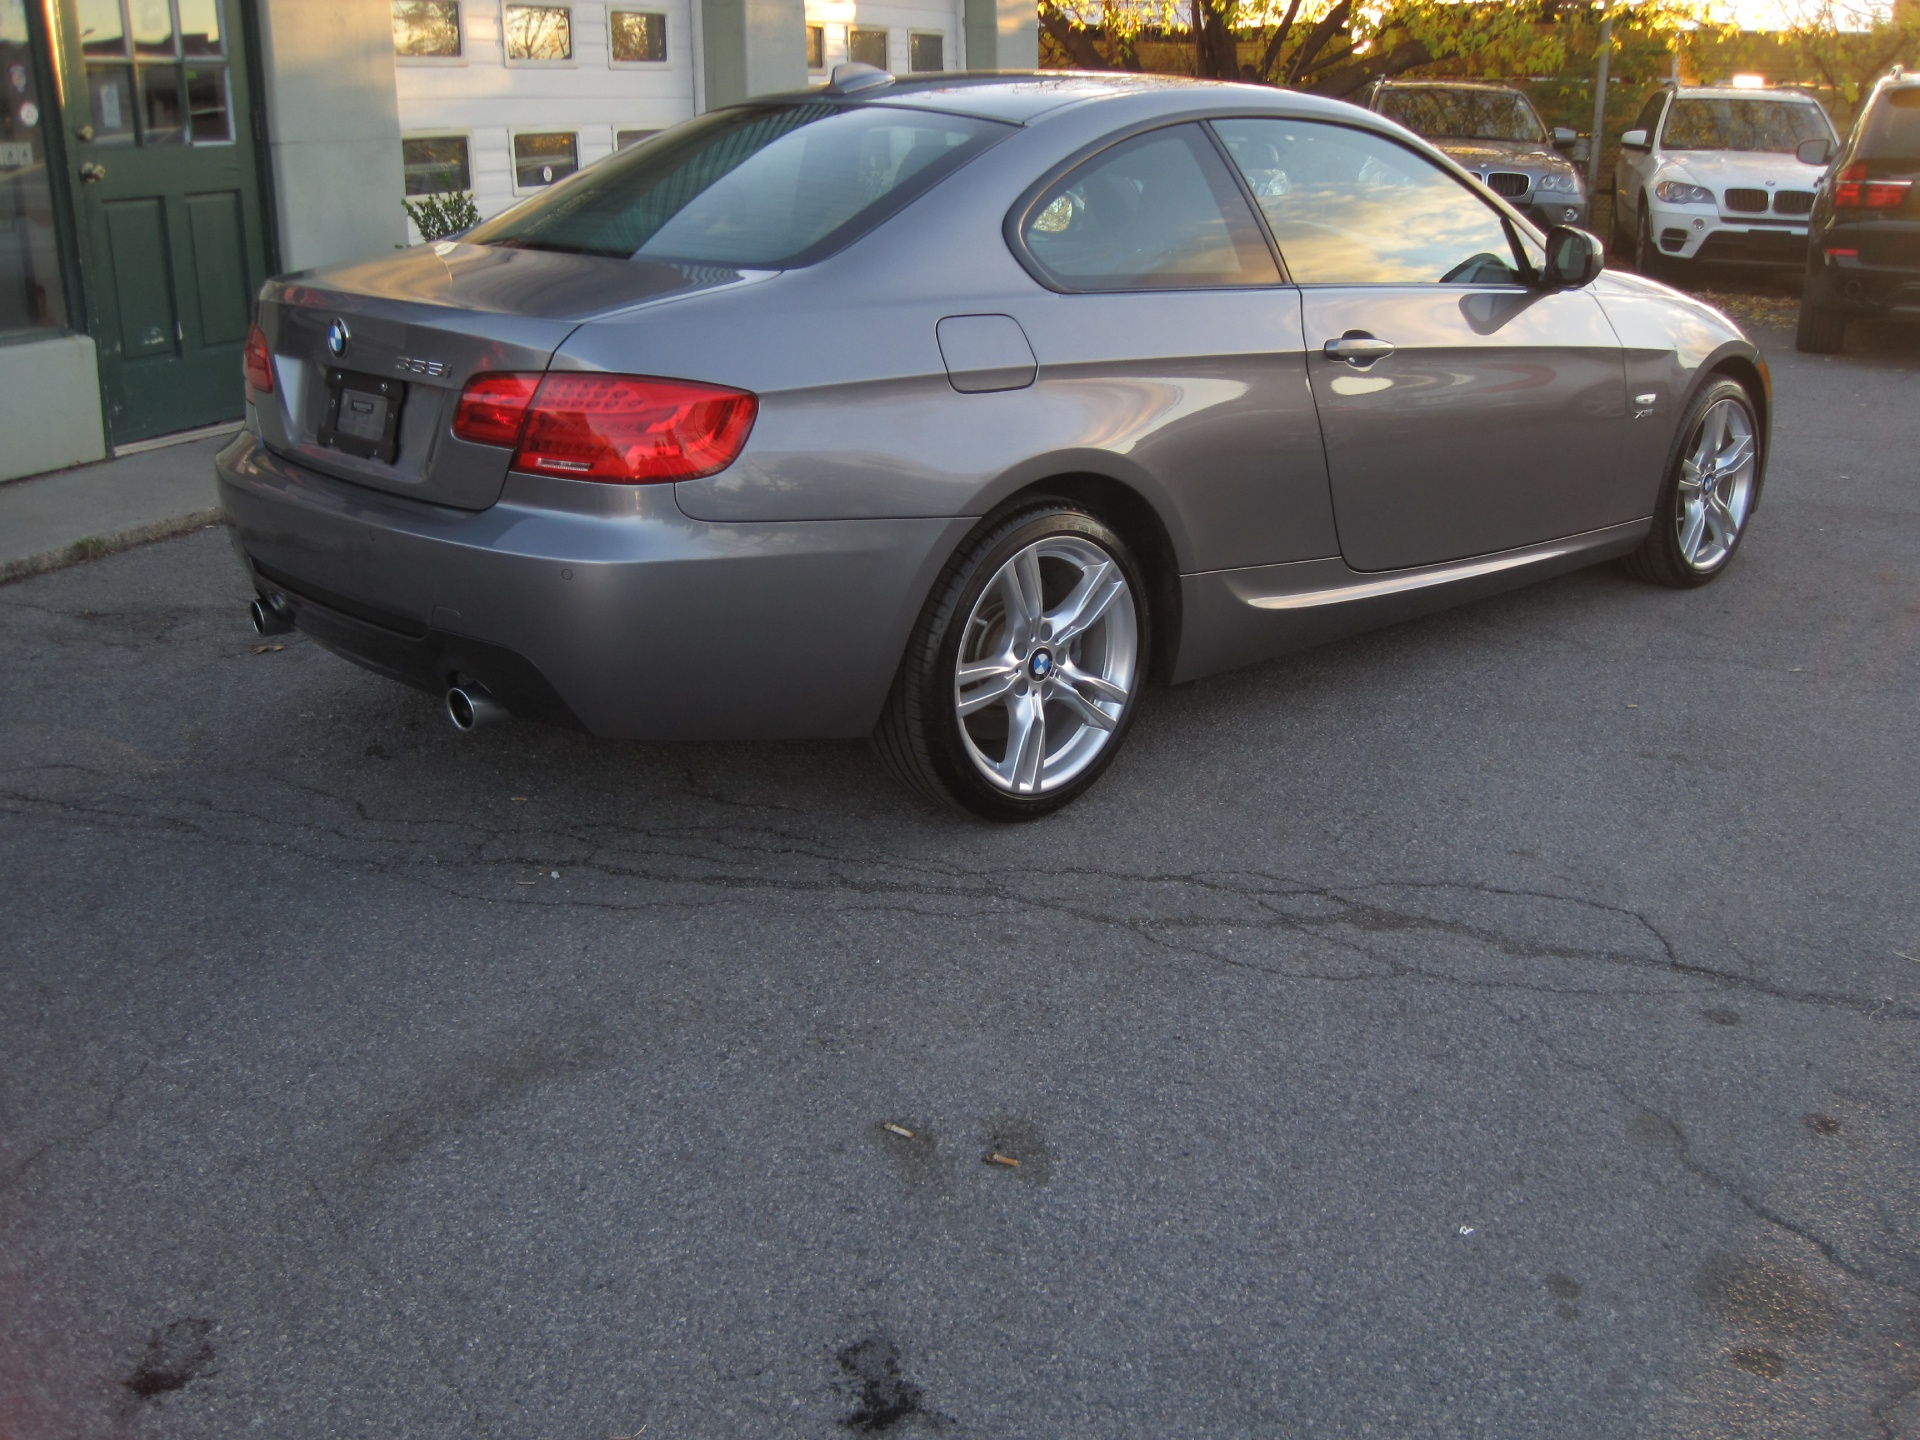 BMW Series I XDrive COUPE AWDLOADEDMSPORTPREMIUM - Bmw 335i xdrive m sport